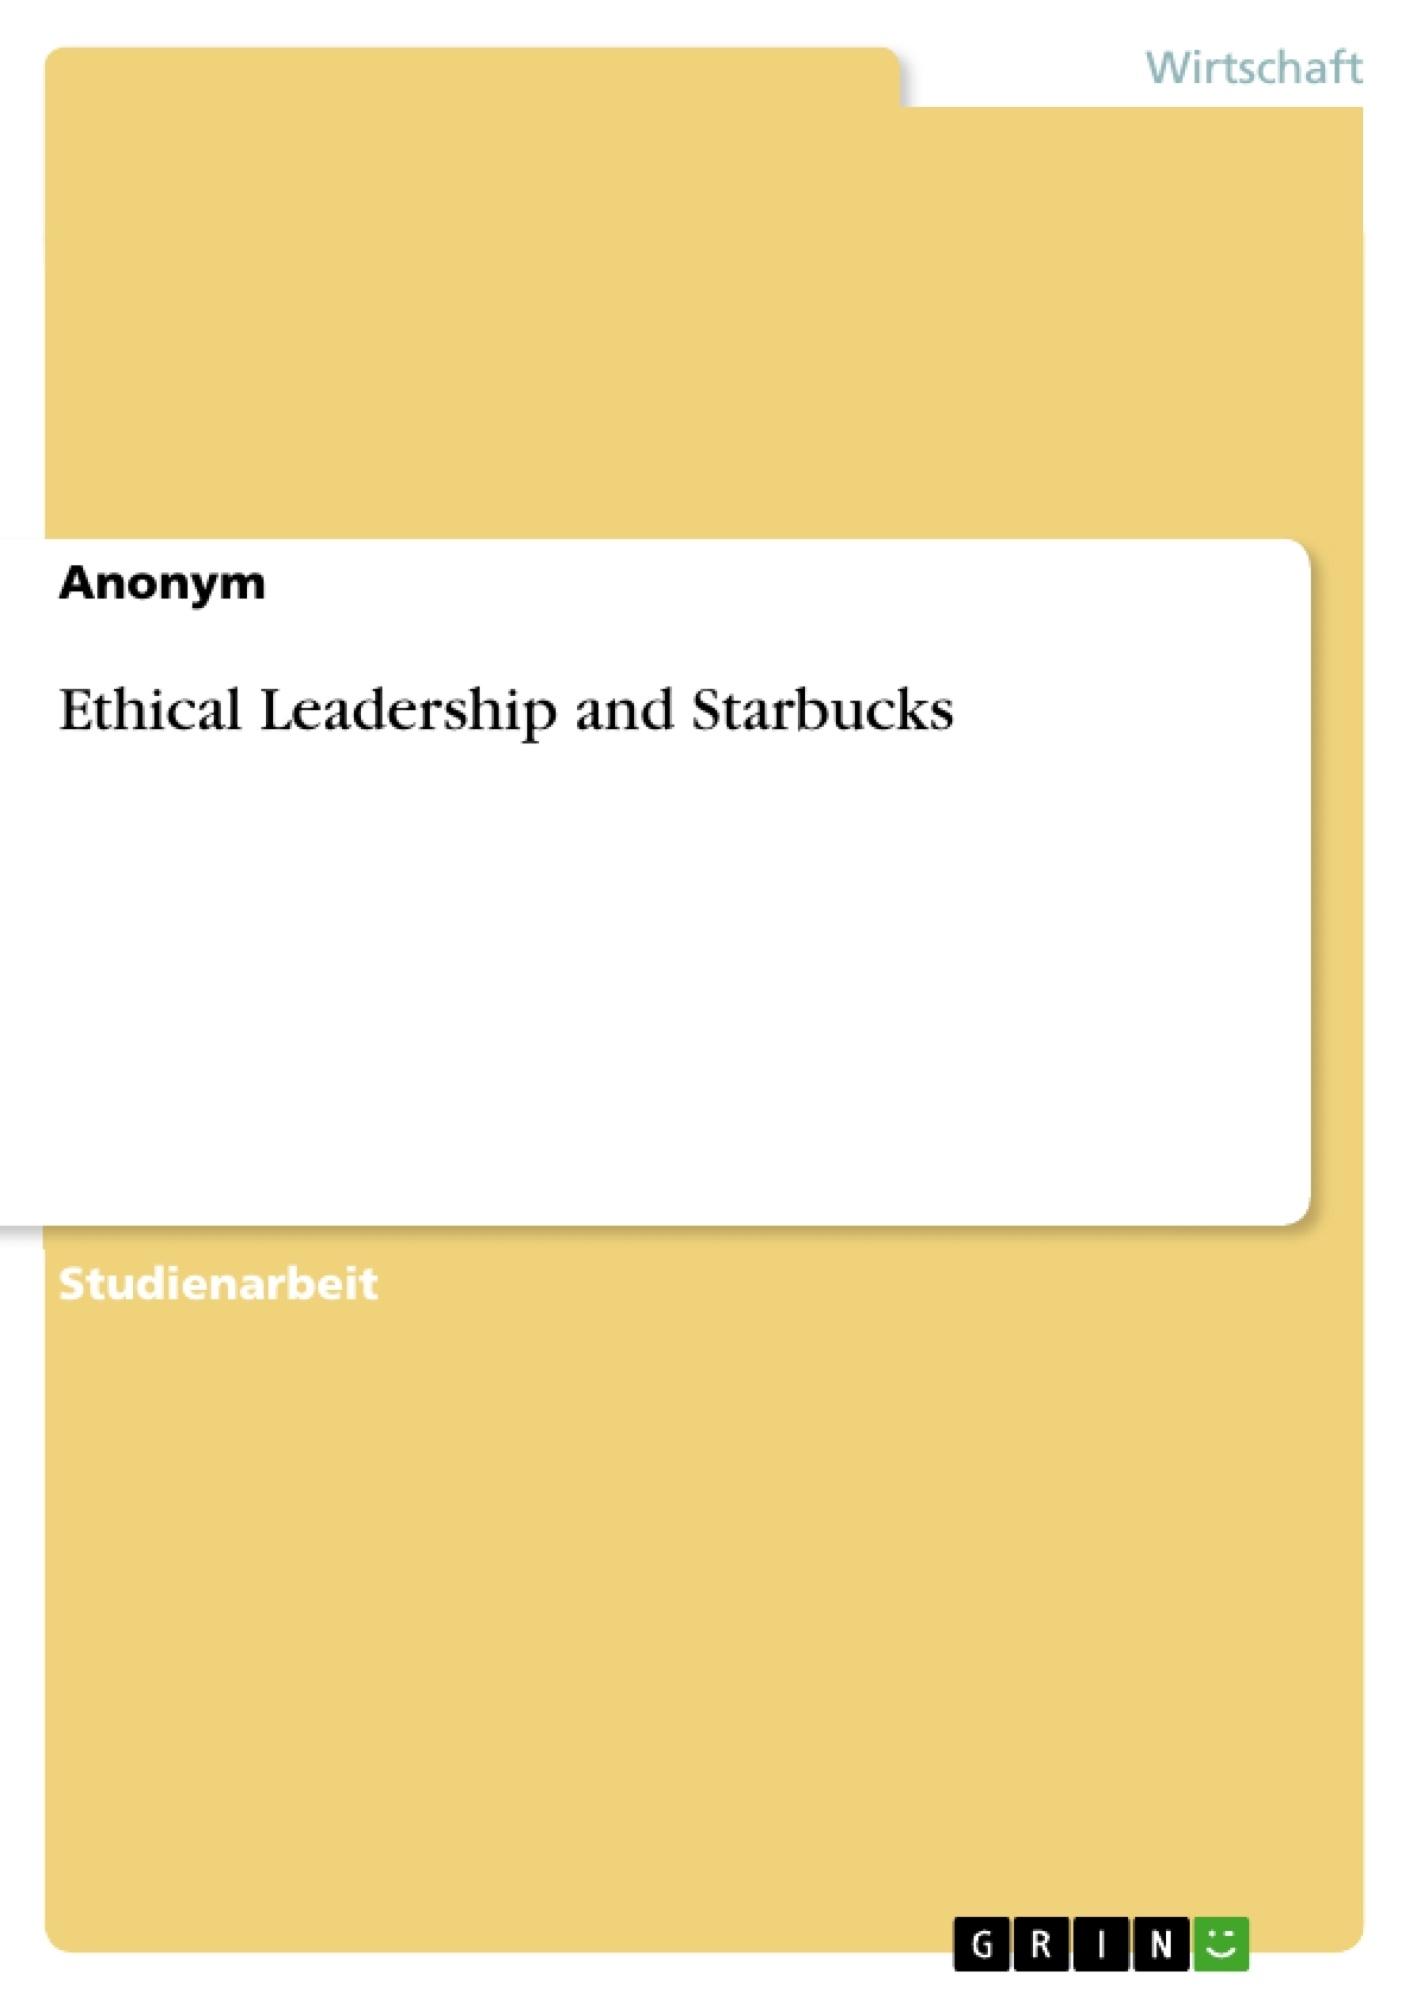 Titel: Ethical Leadership and Starbucks